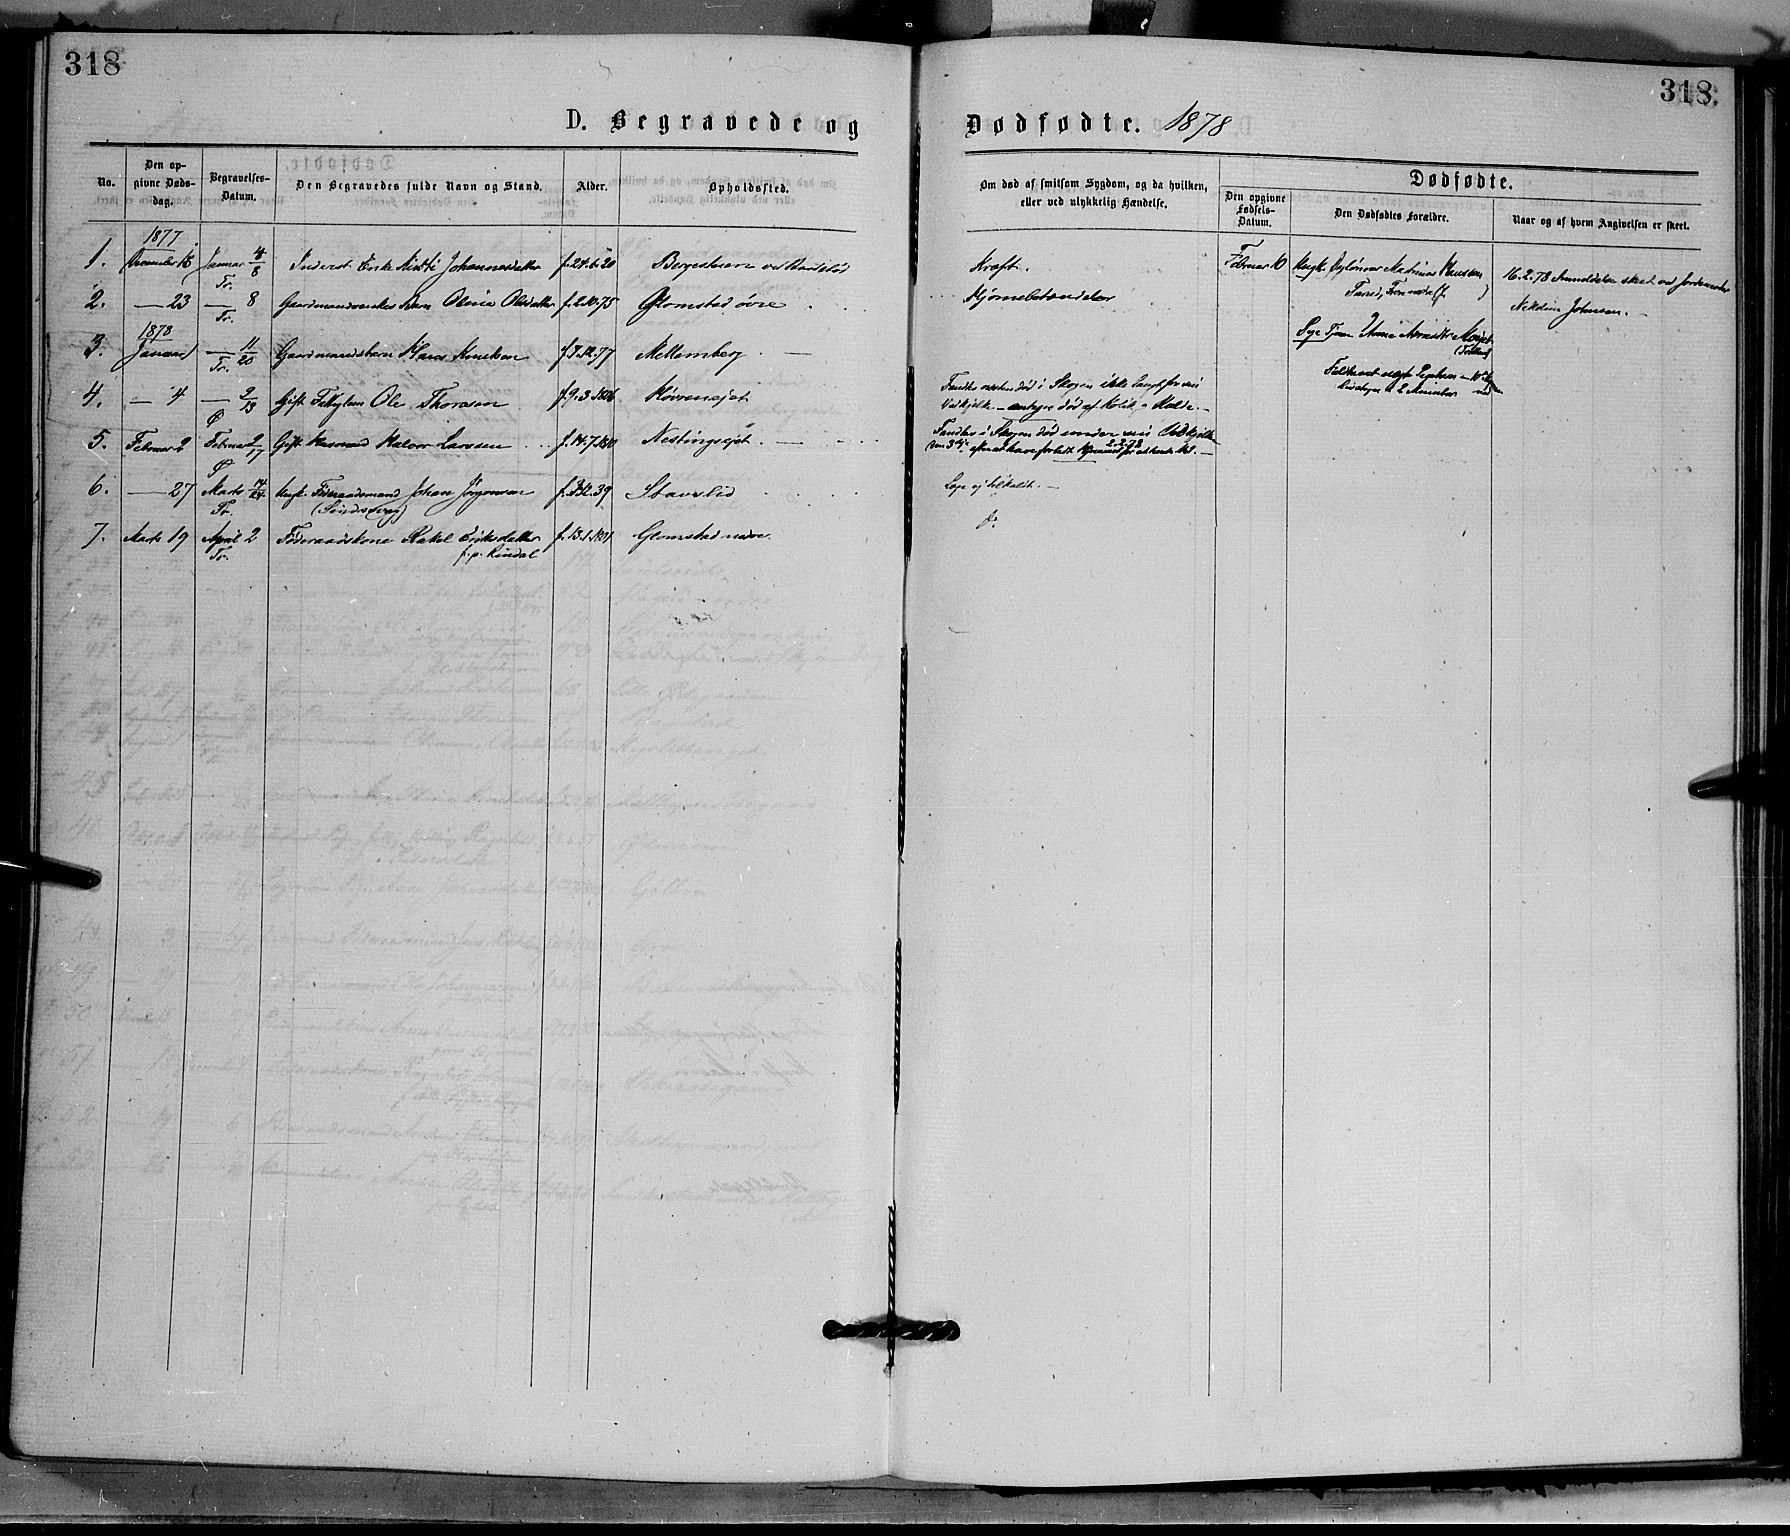 SAH, Øyer prestekontor, Ministerialbok nr. 7, 1875-1878, s. 318